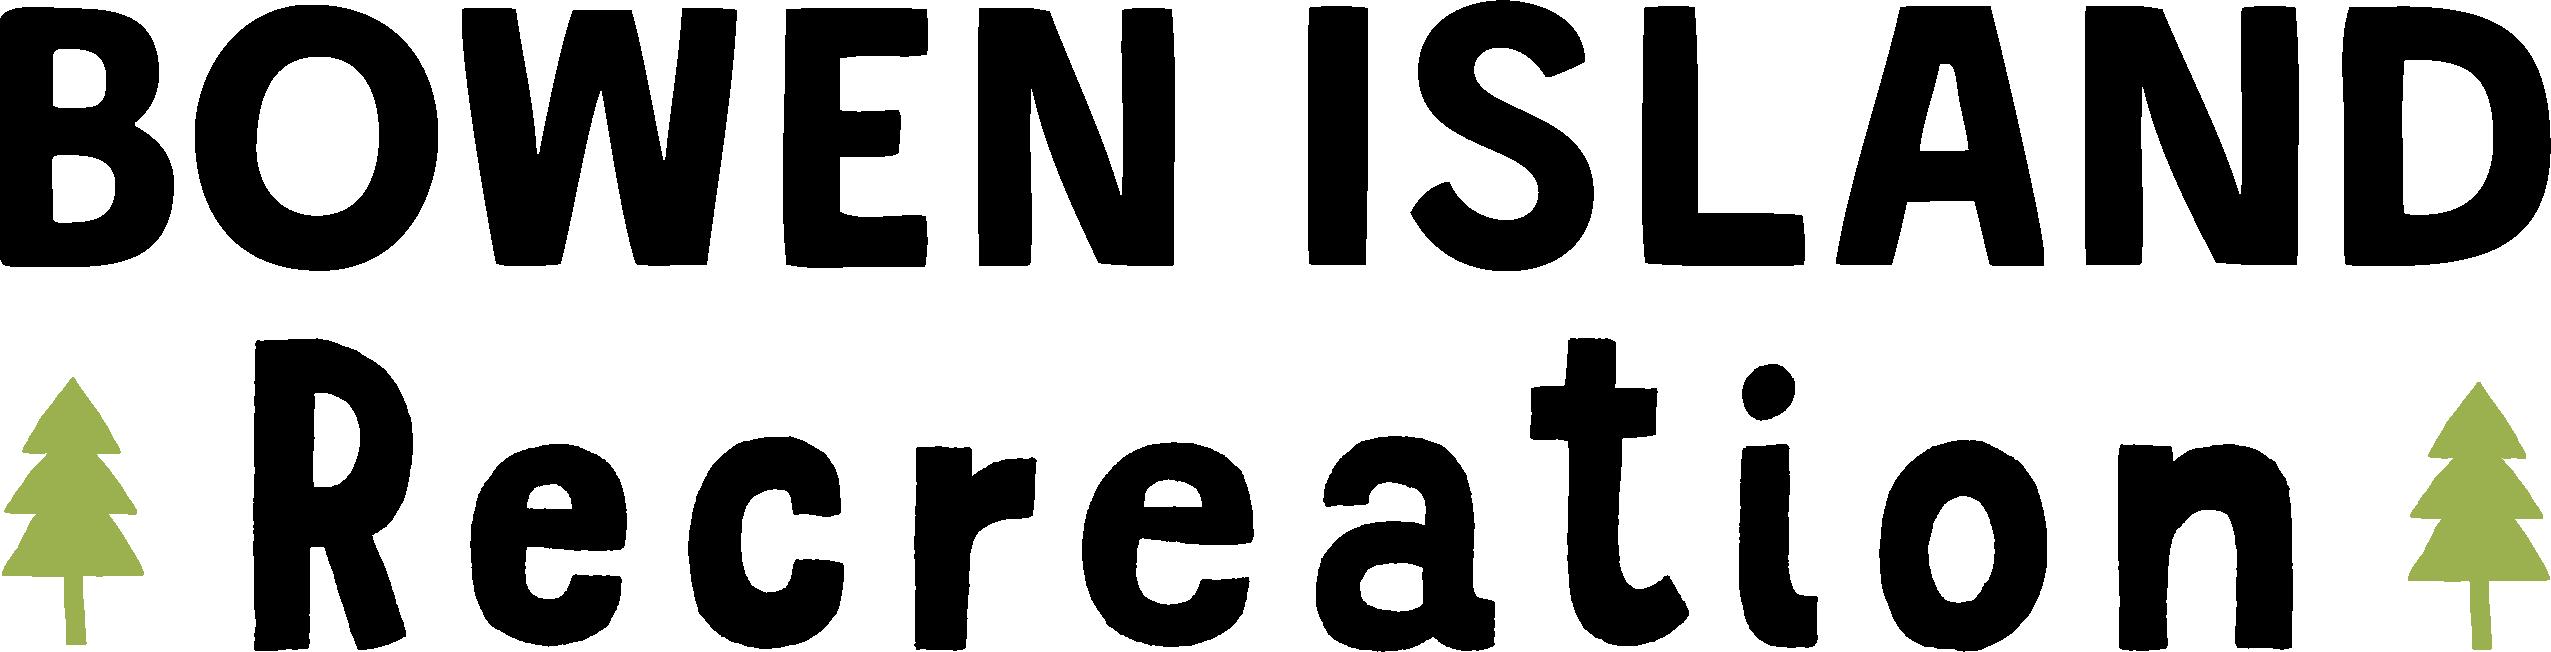 New BICR logo